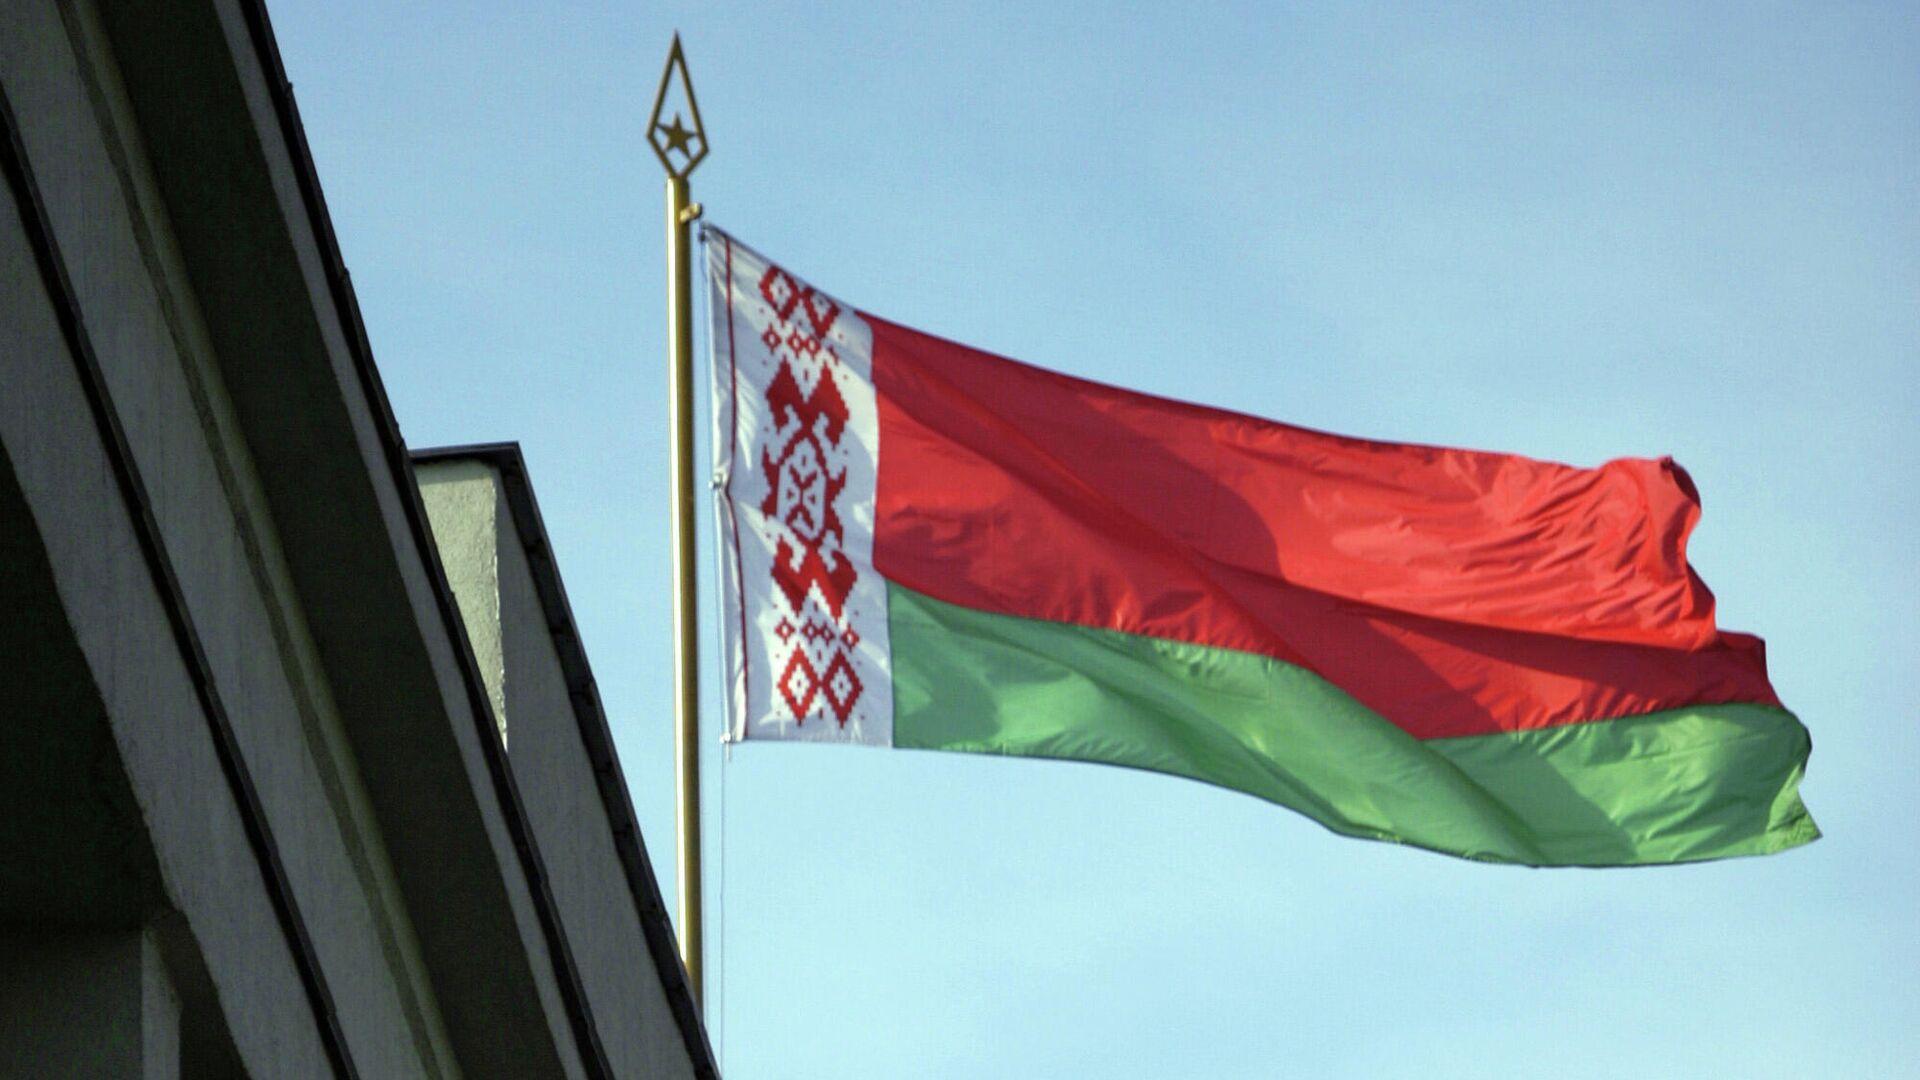 Флаг Белоруссии - РИА Новости, 1920, 15.10.2020